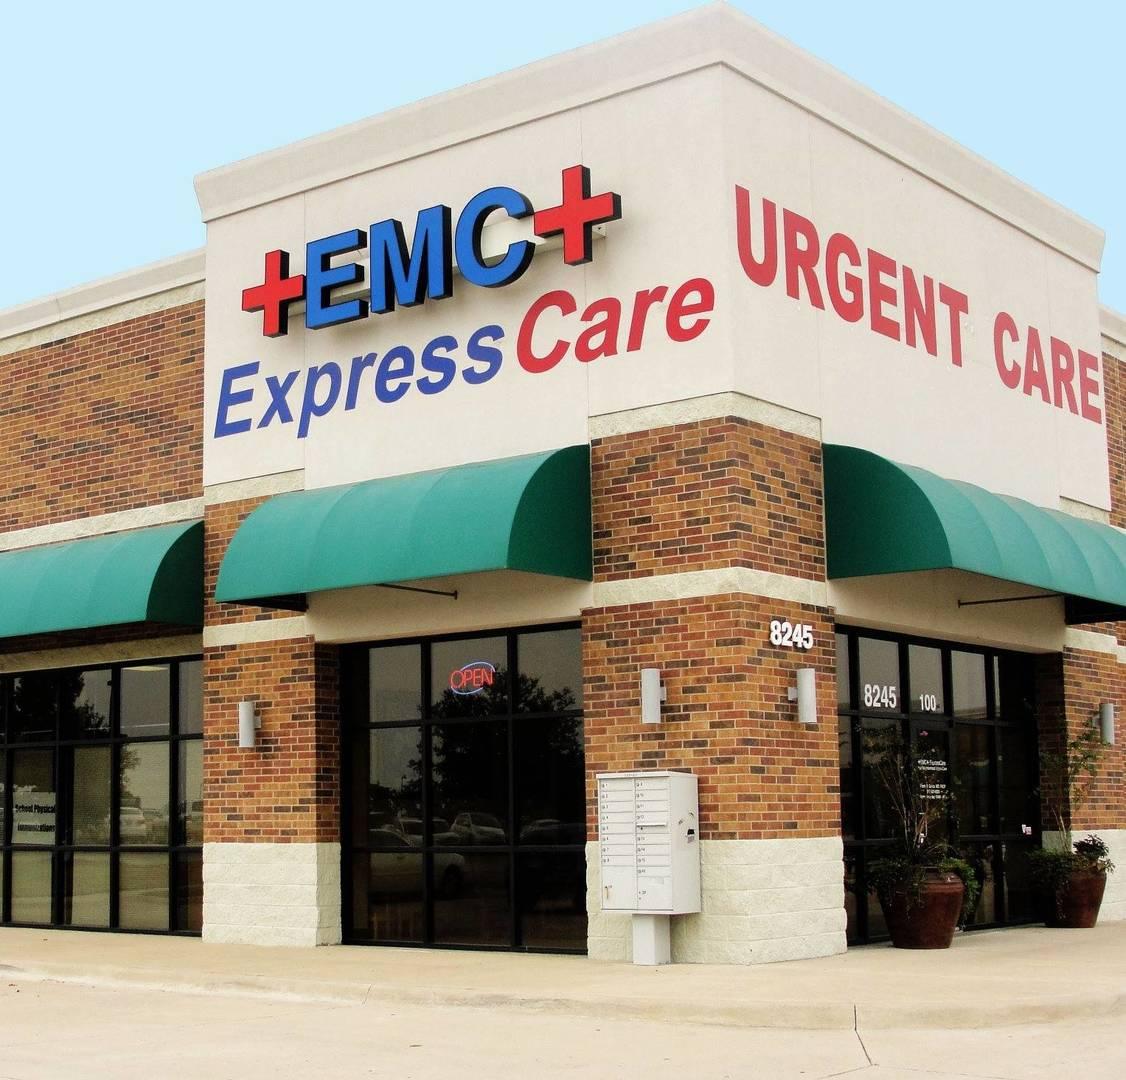 EMC Express Care